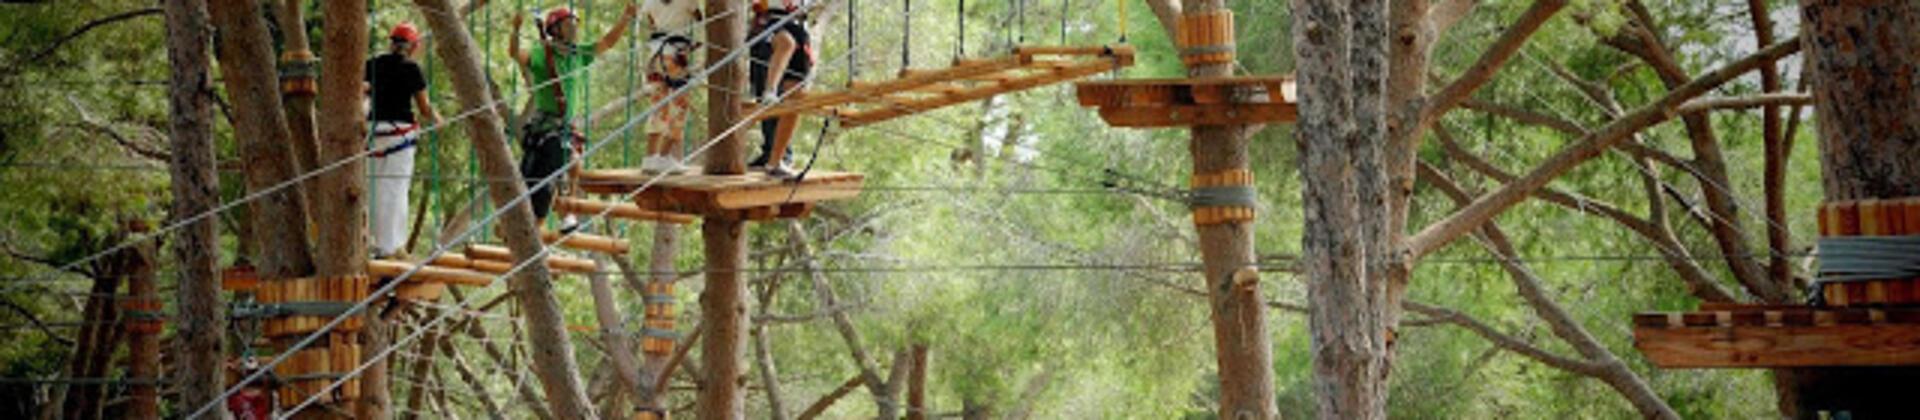 Adventure Park Cerrano a Pineto